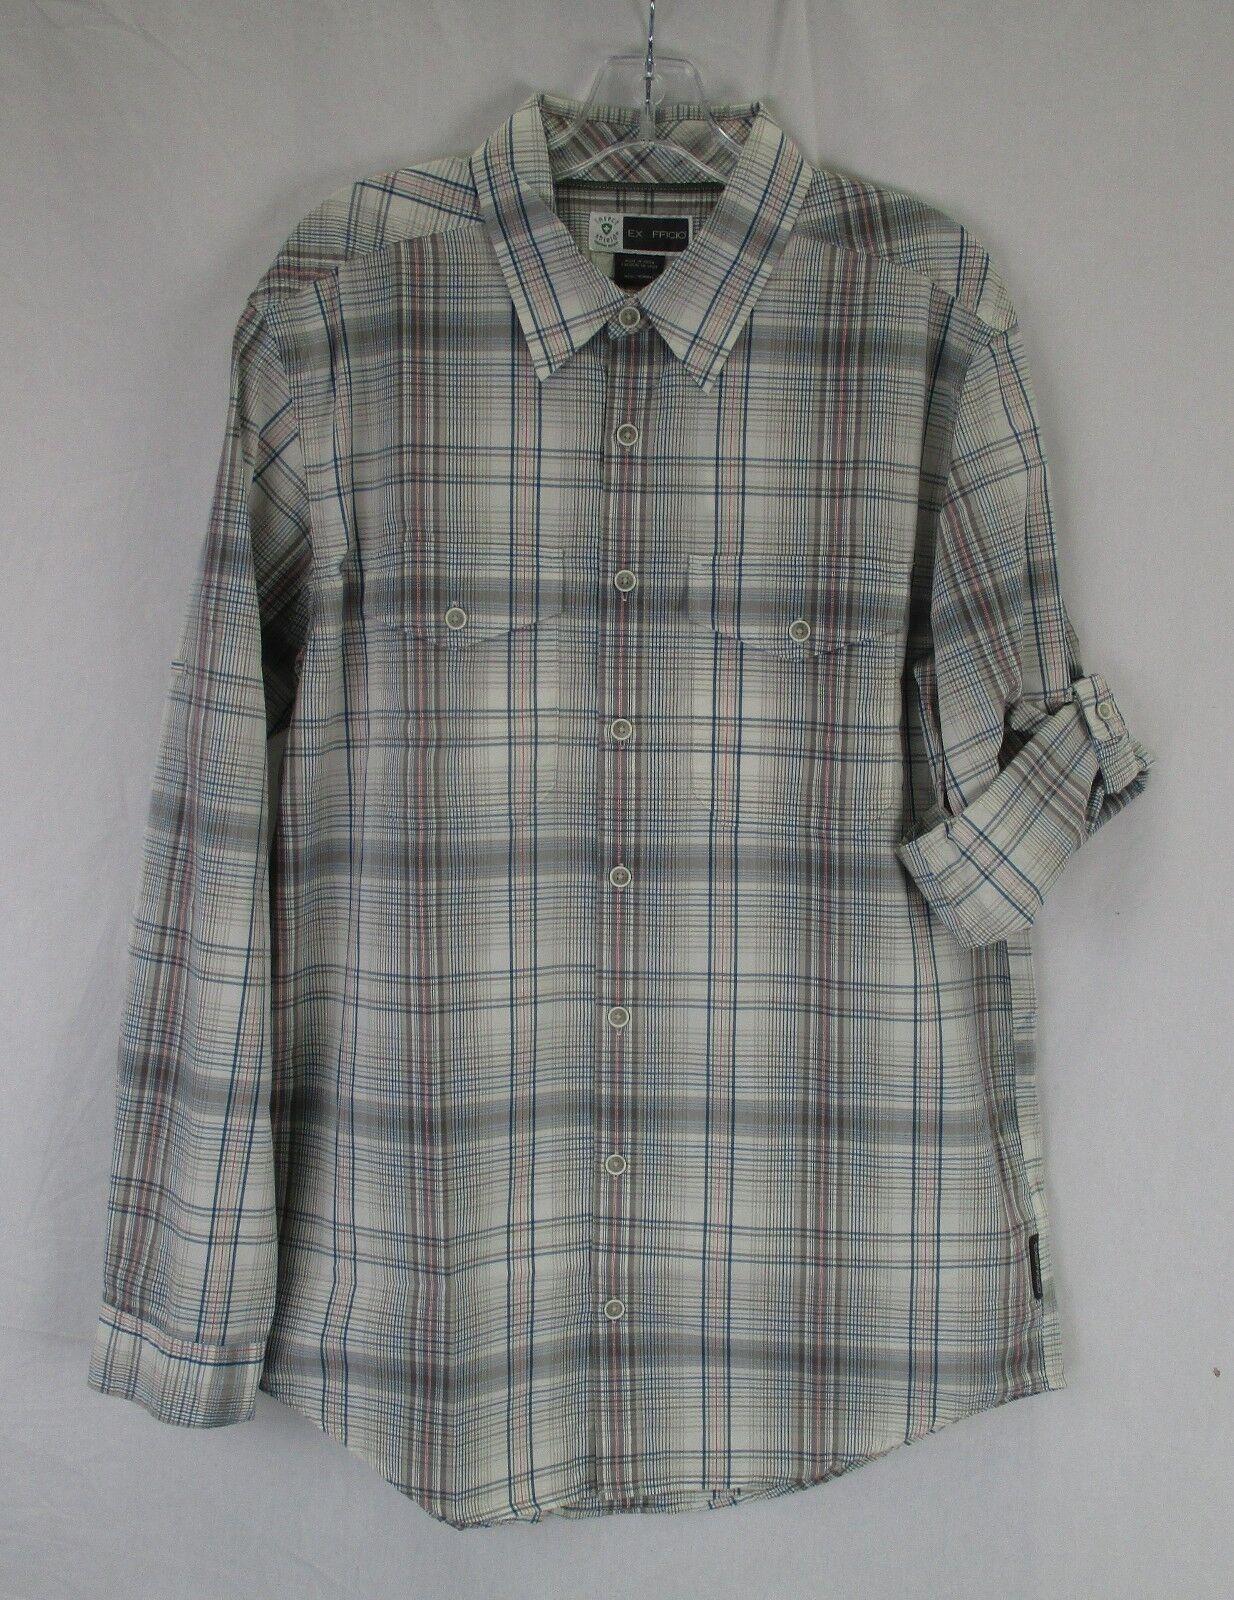 Exofficio Mens Bugsaway Sol Cool Plaid Shirt 1101 2923 Corsair Size Large